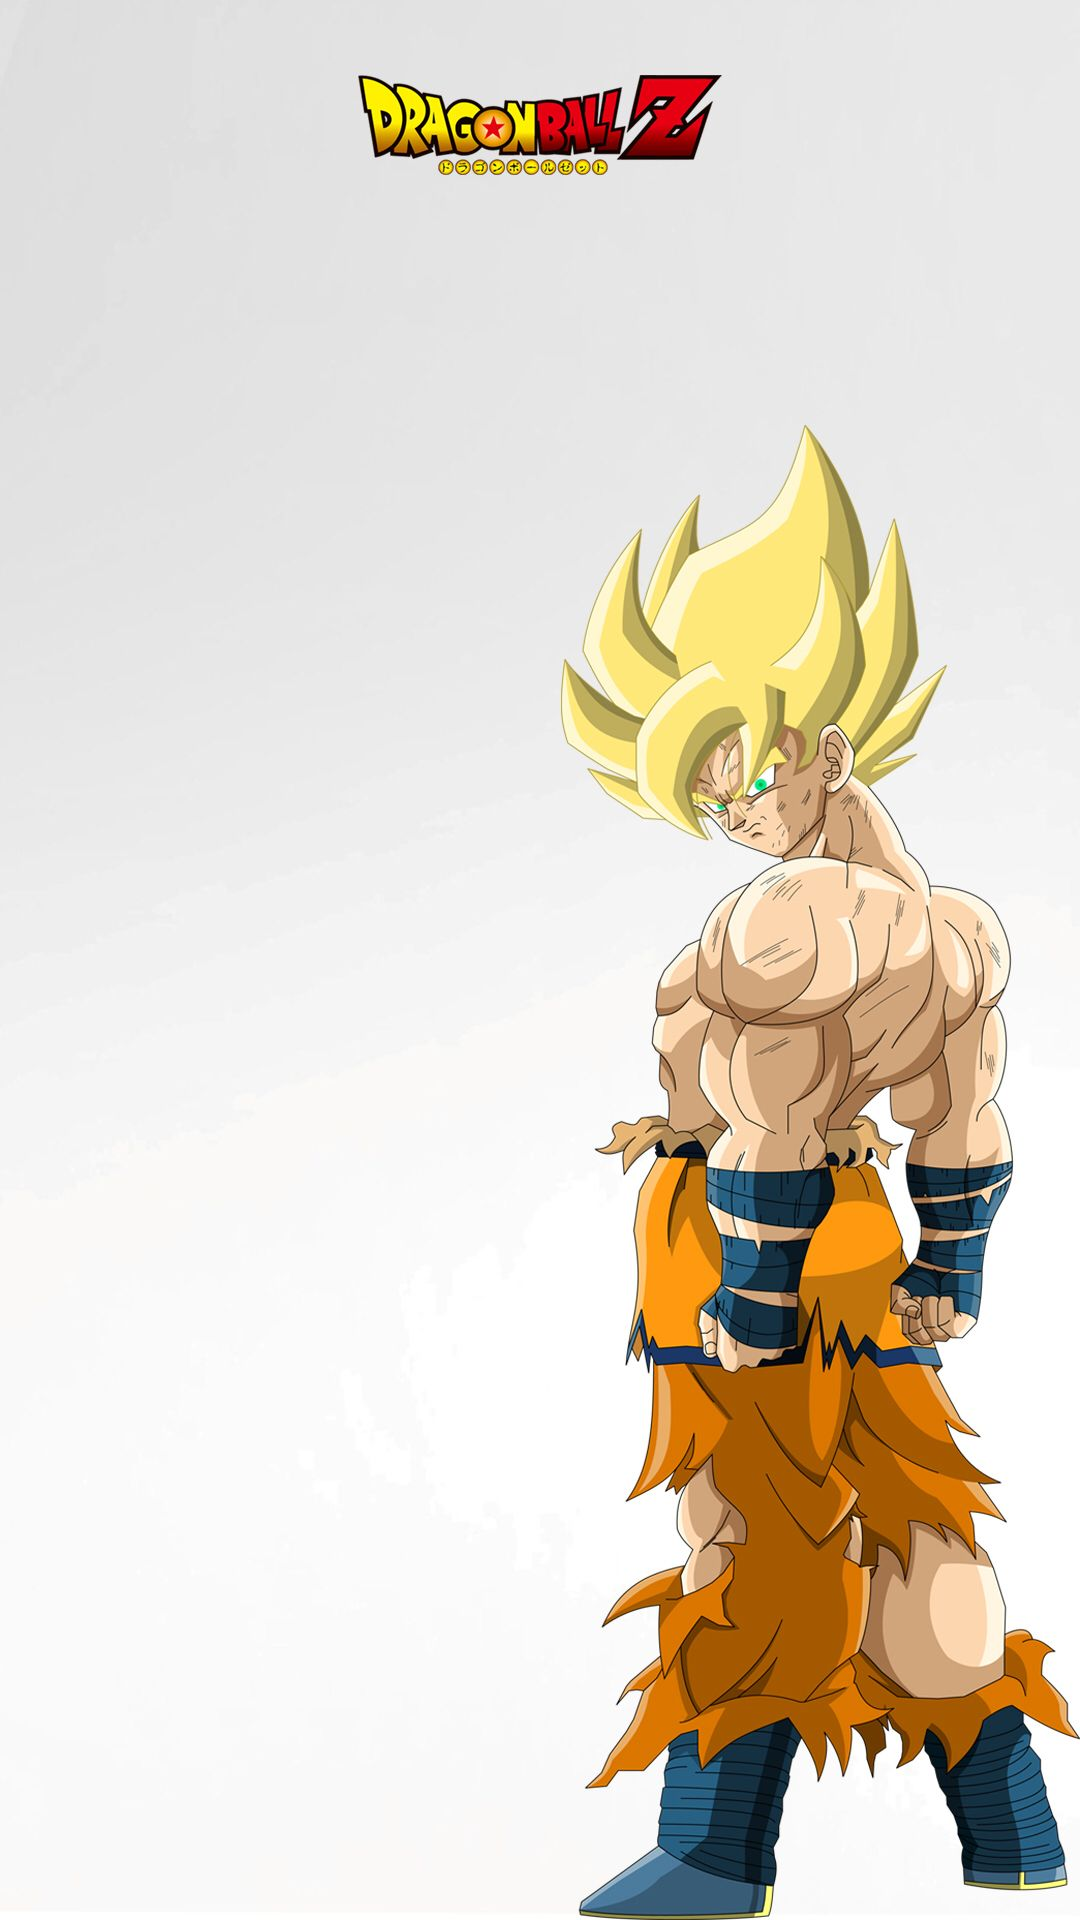 Goku Ssj Iphone 6 Wallpaper Dragon Ball Wallpaper Iphone Goku Wallpaper Iphone Live Wallpaper Iphone